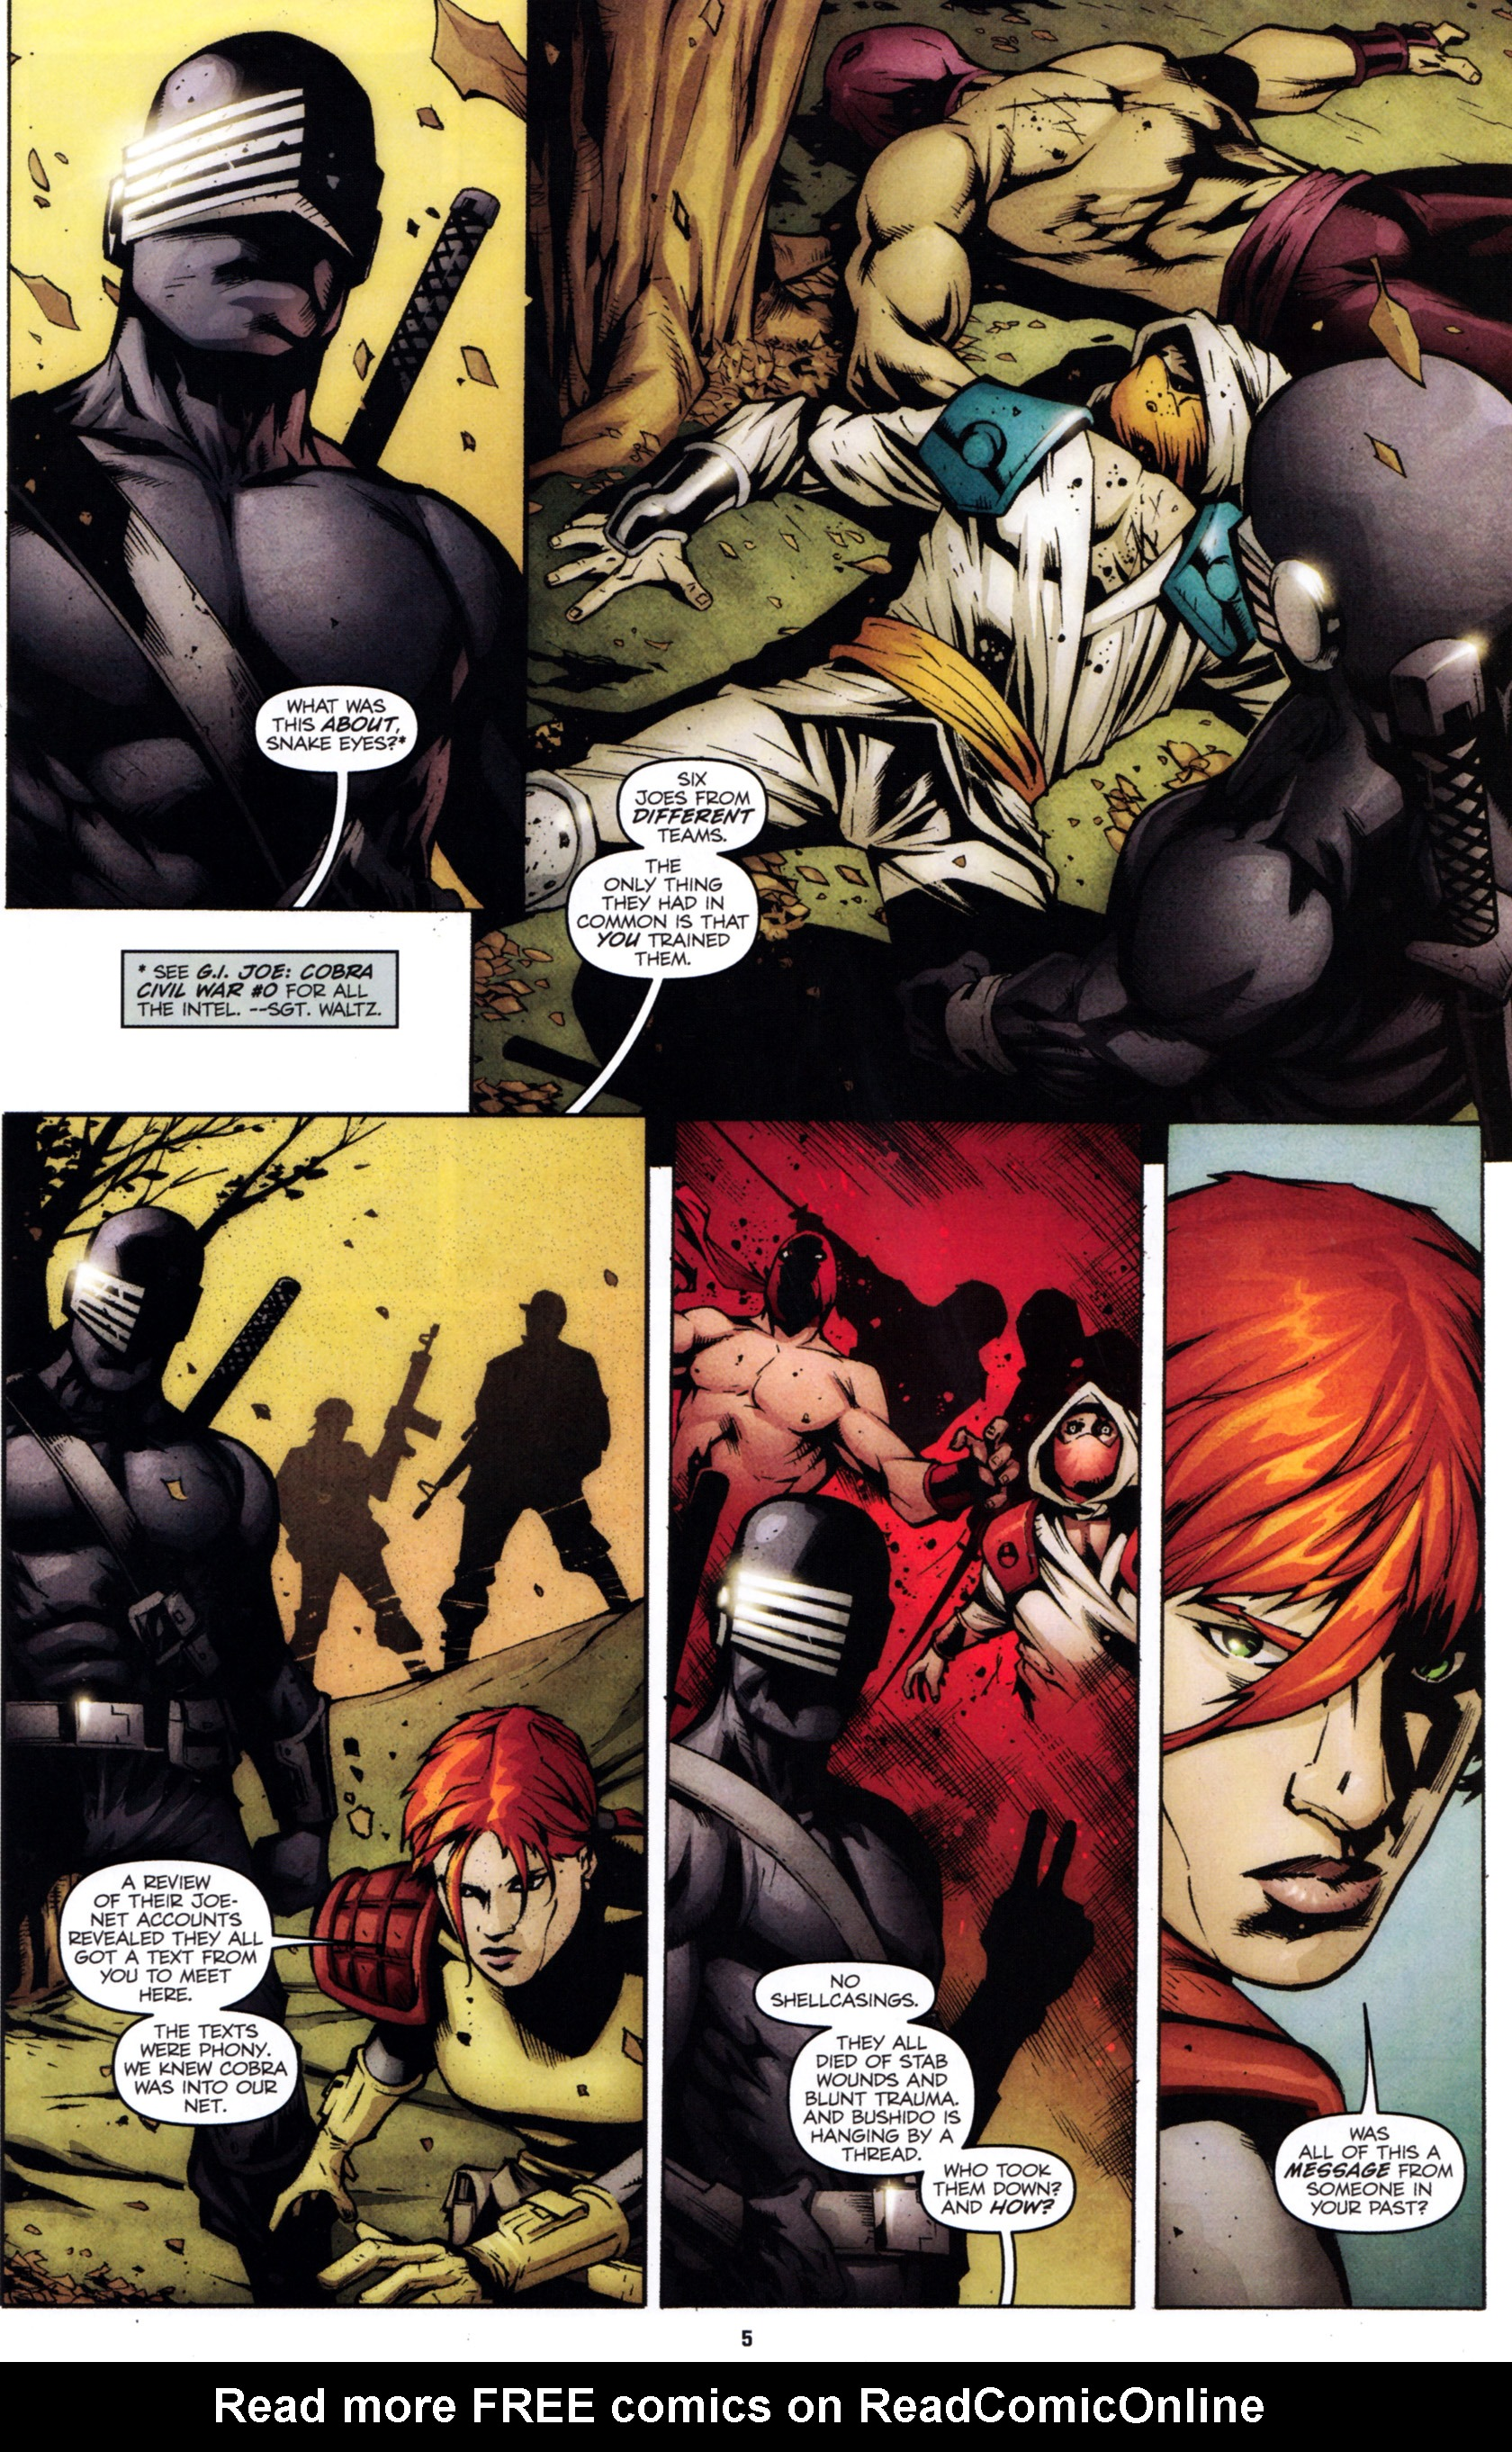 Read online G.I. Joe: Snake Eyes comic -  Issue #1 - 8